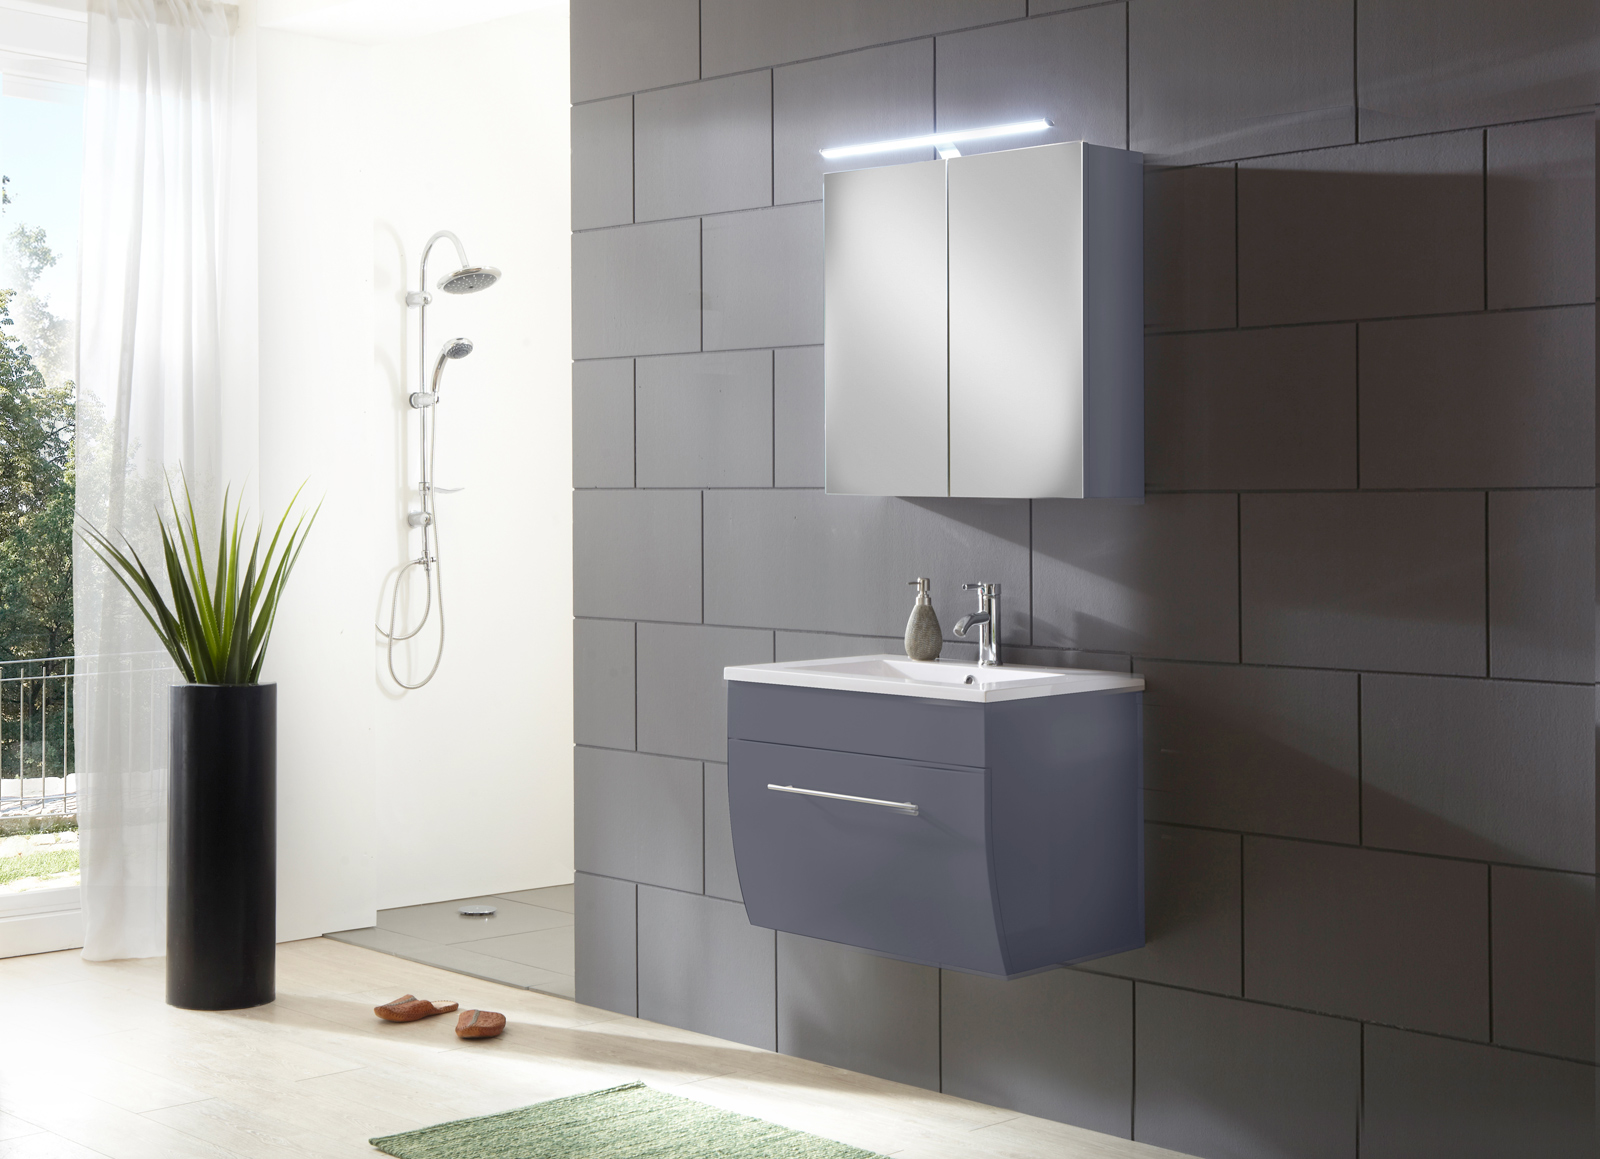 sam badezimmerm bel zagona 2tlg grau hochglanz 70 cm auf. Black Bedroom Furniture Sets. Home Design Ideas